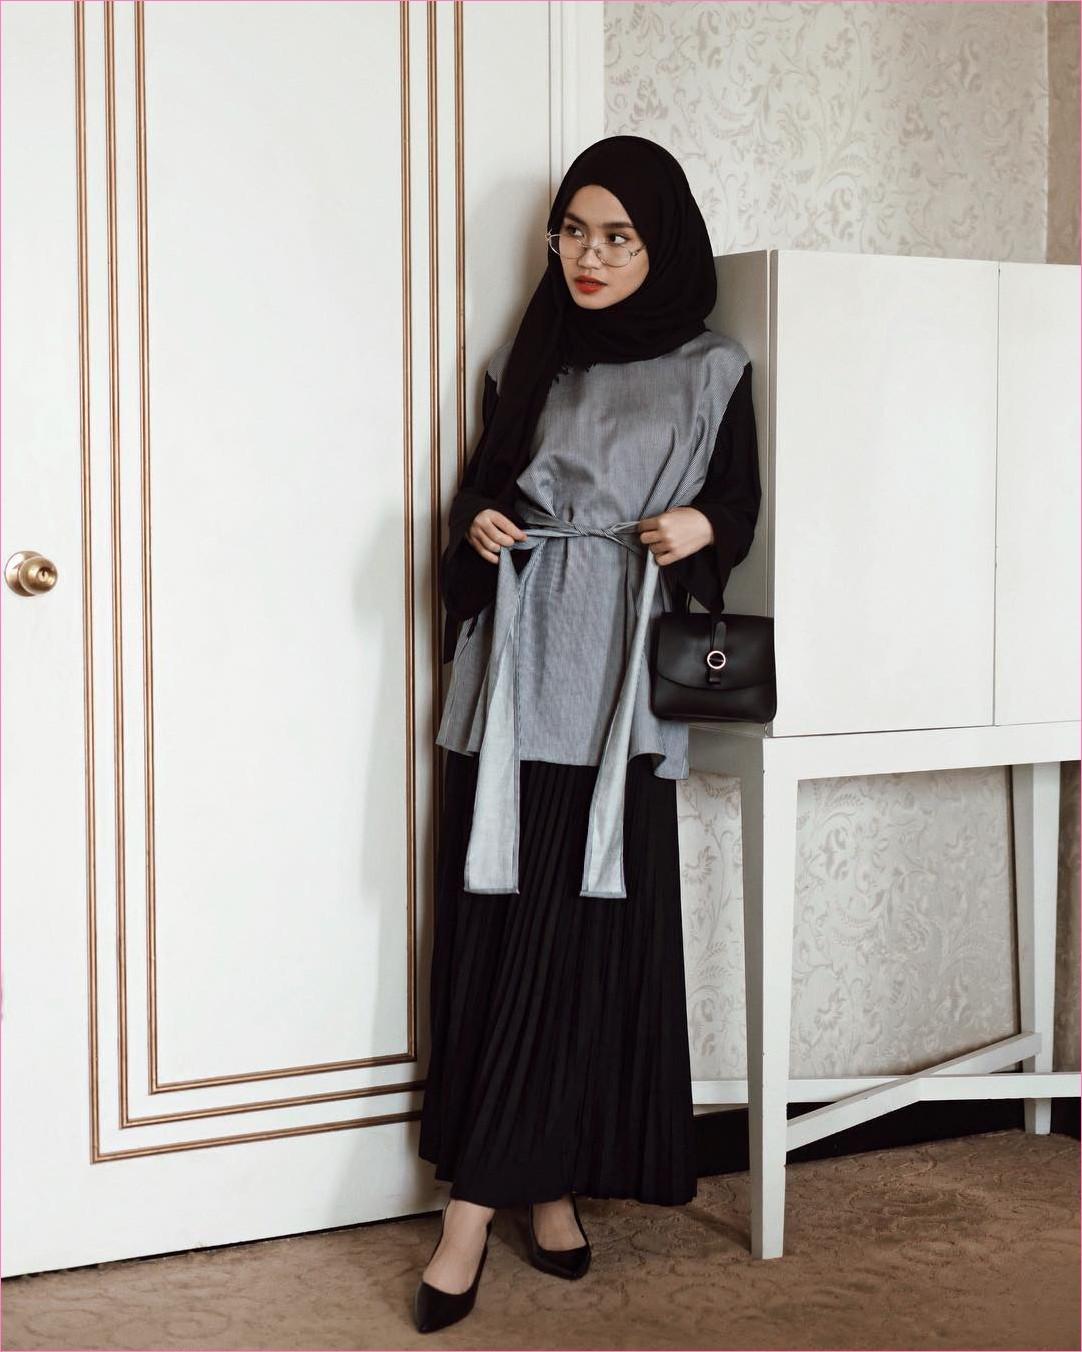 Outfit Rok Untuk Hijabers Ala Selebgram 2018 broomstick skirt wedges high heels hijab pashmina rawis slingbags hitam top blouse outer abu kacamata bulat putih ootd trendy